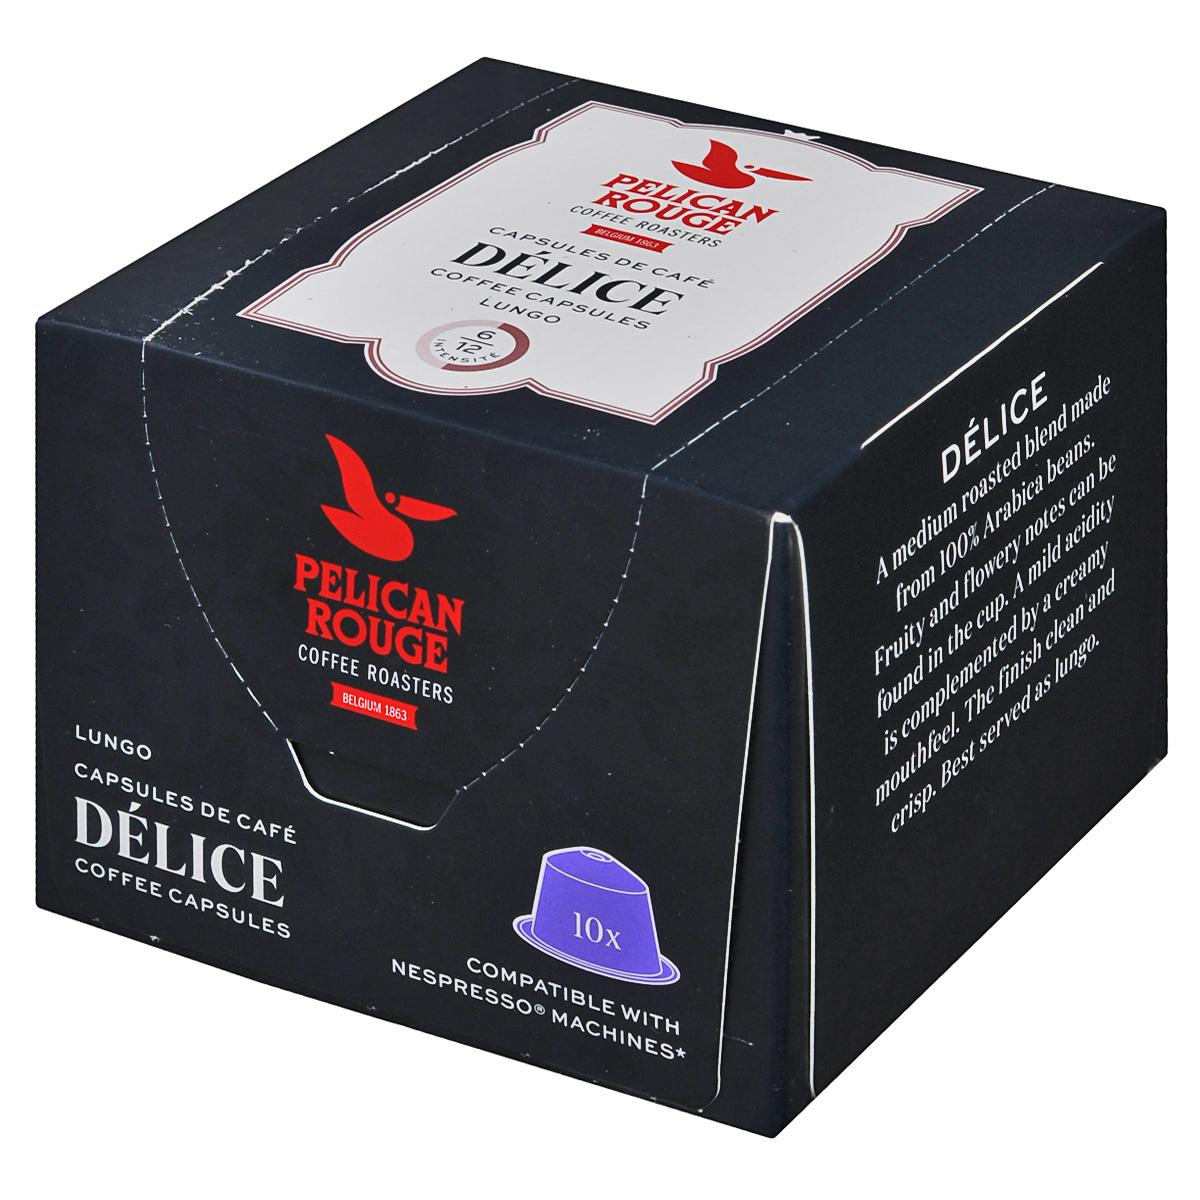 Pelican Rouge Delice кофе в капсулах, 10 шт кофе caffitaly кофе в капсулах mesico